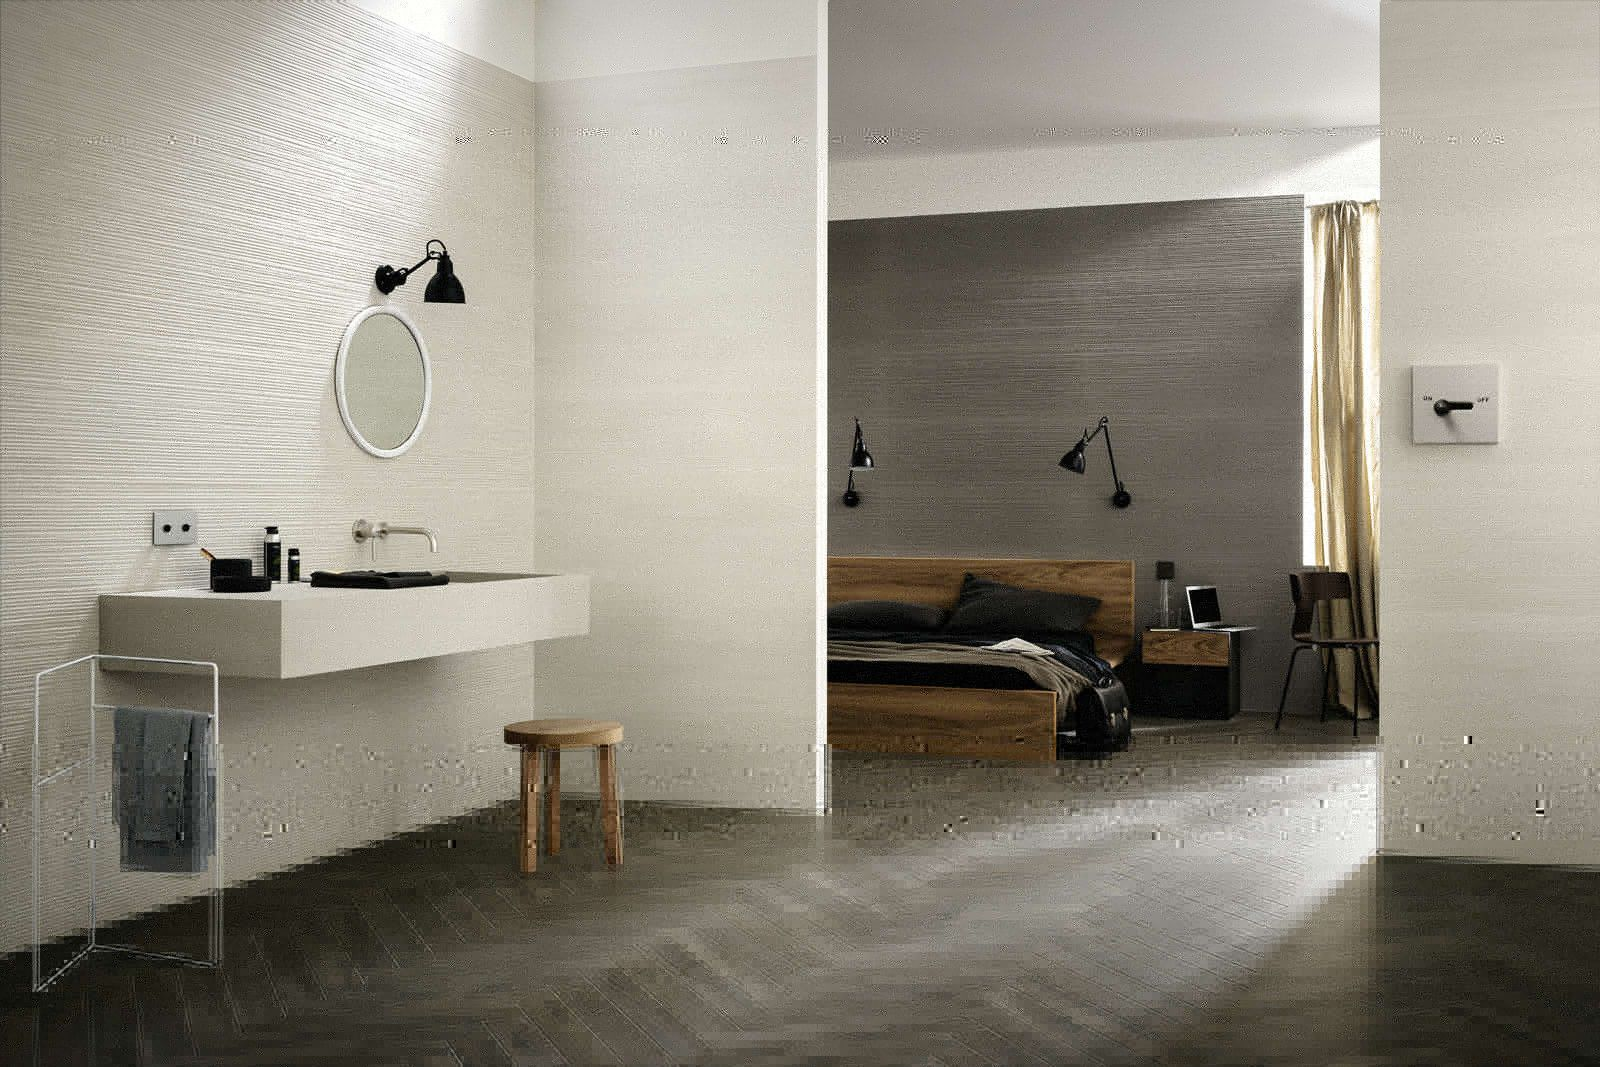 marazzi #materika off white 40x120 cm mmfq | #feinsteinzeug, Badezimmer ideen